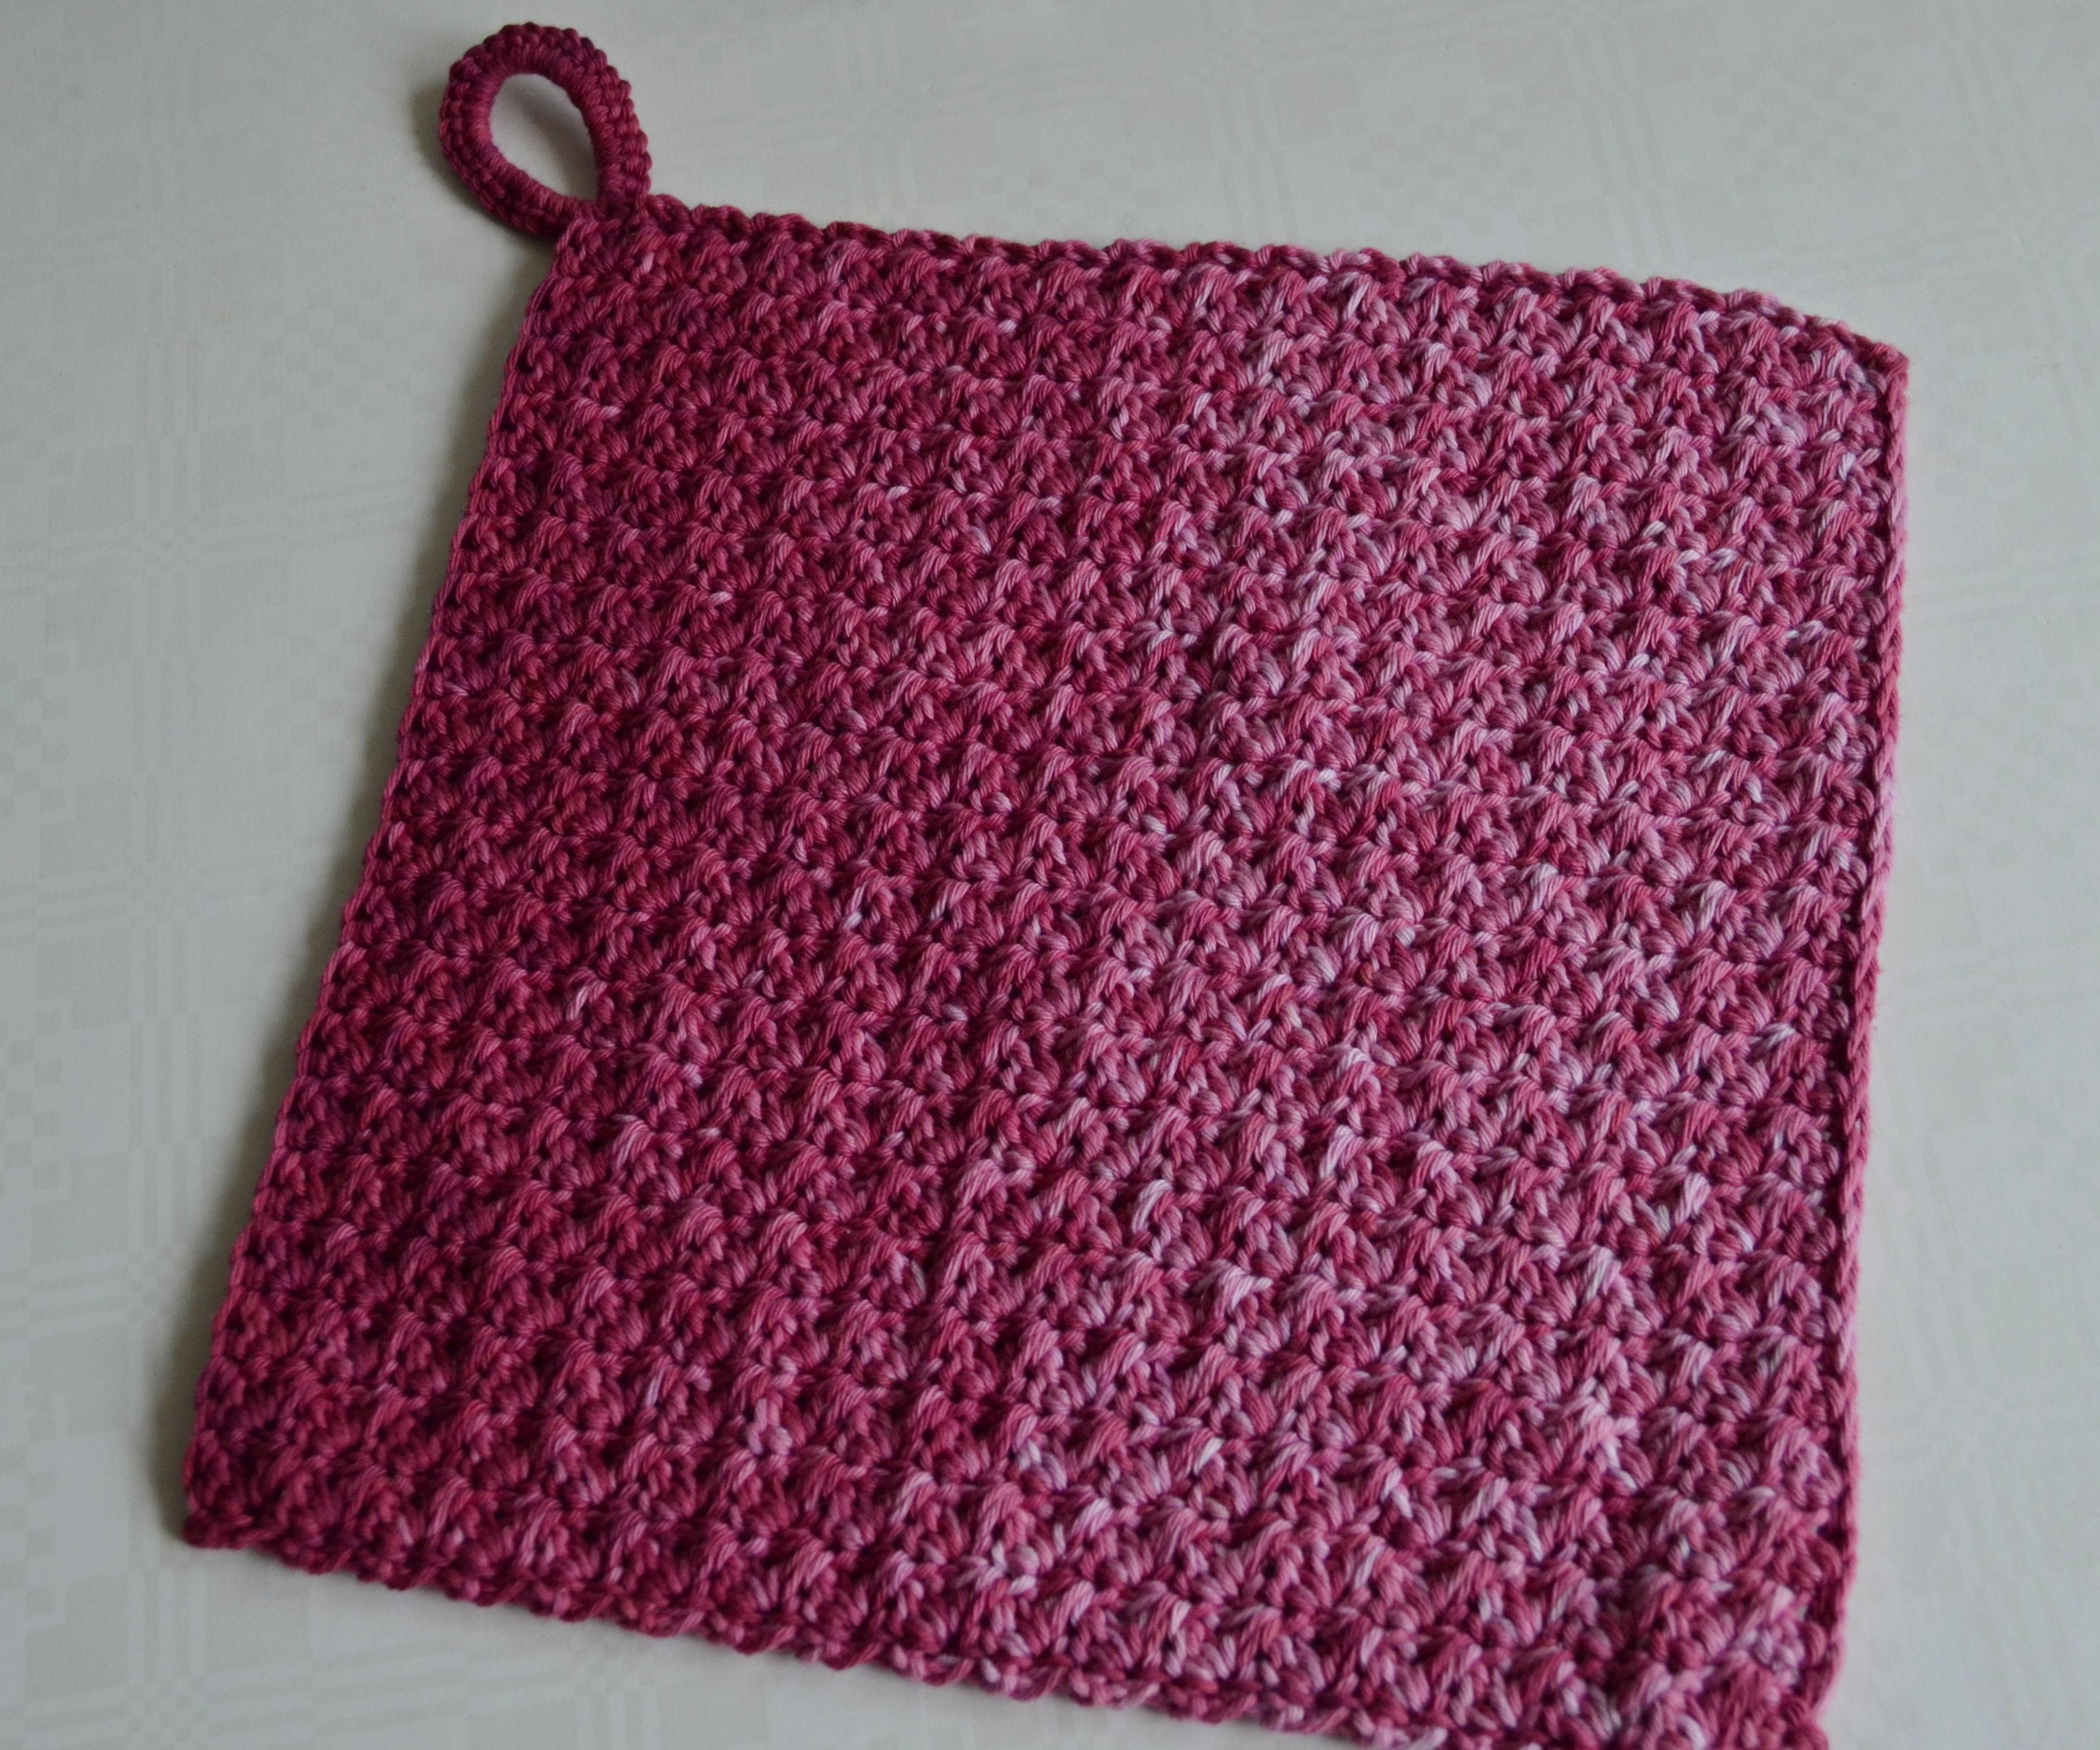 Textured Crochet Washcloth Using Cotton Yarn